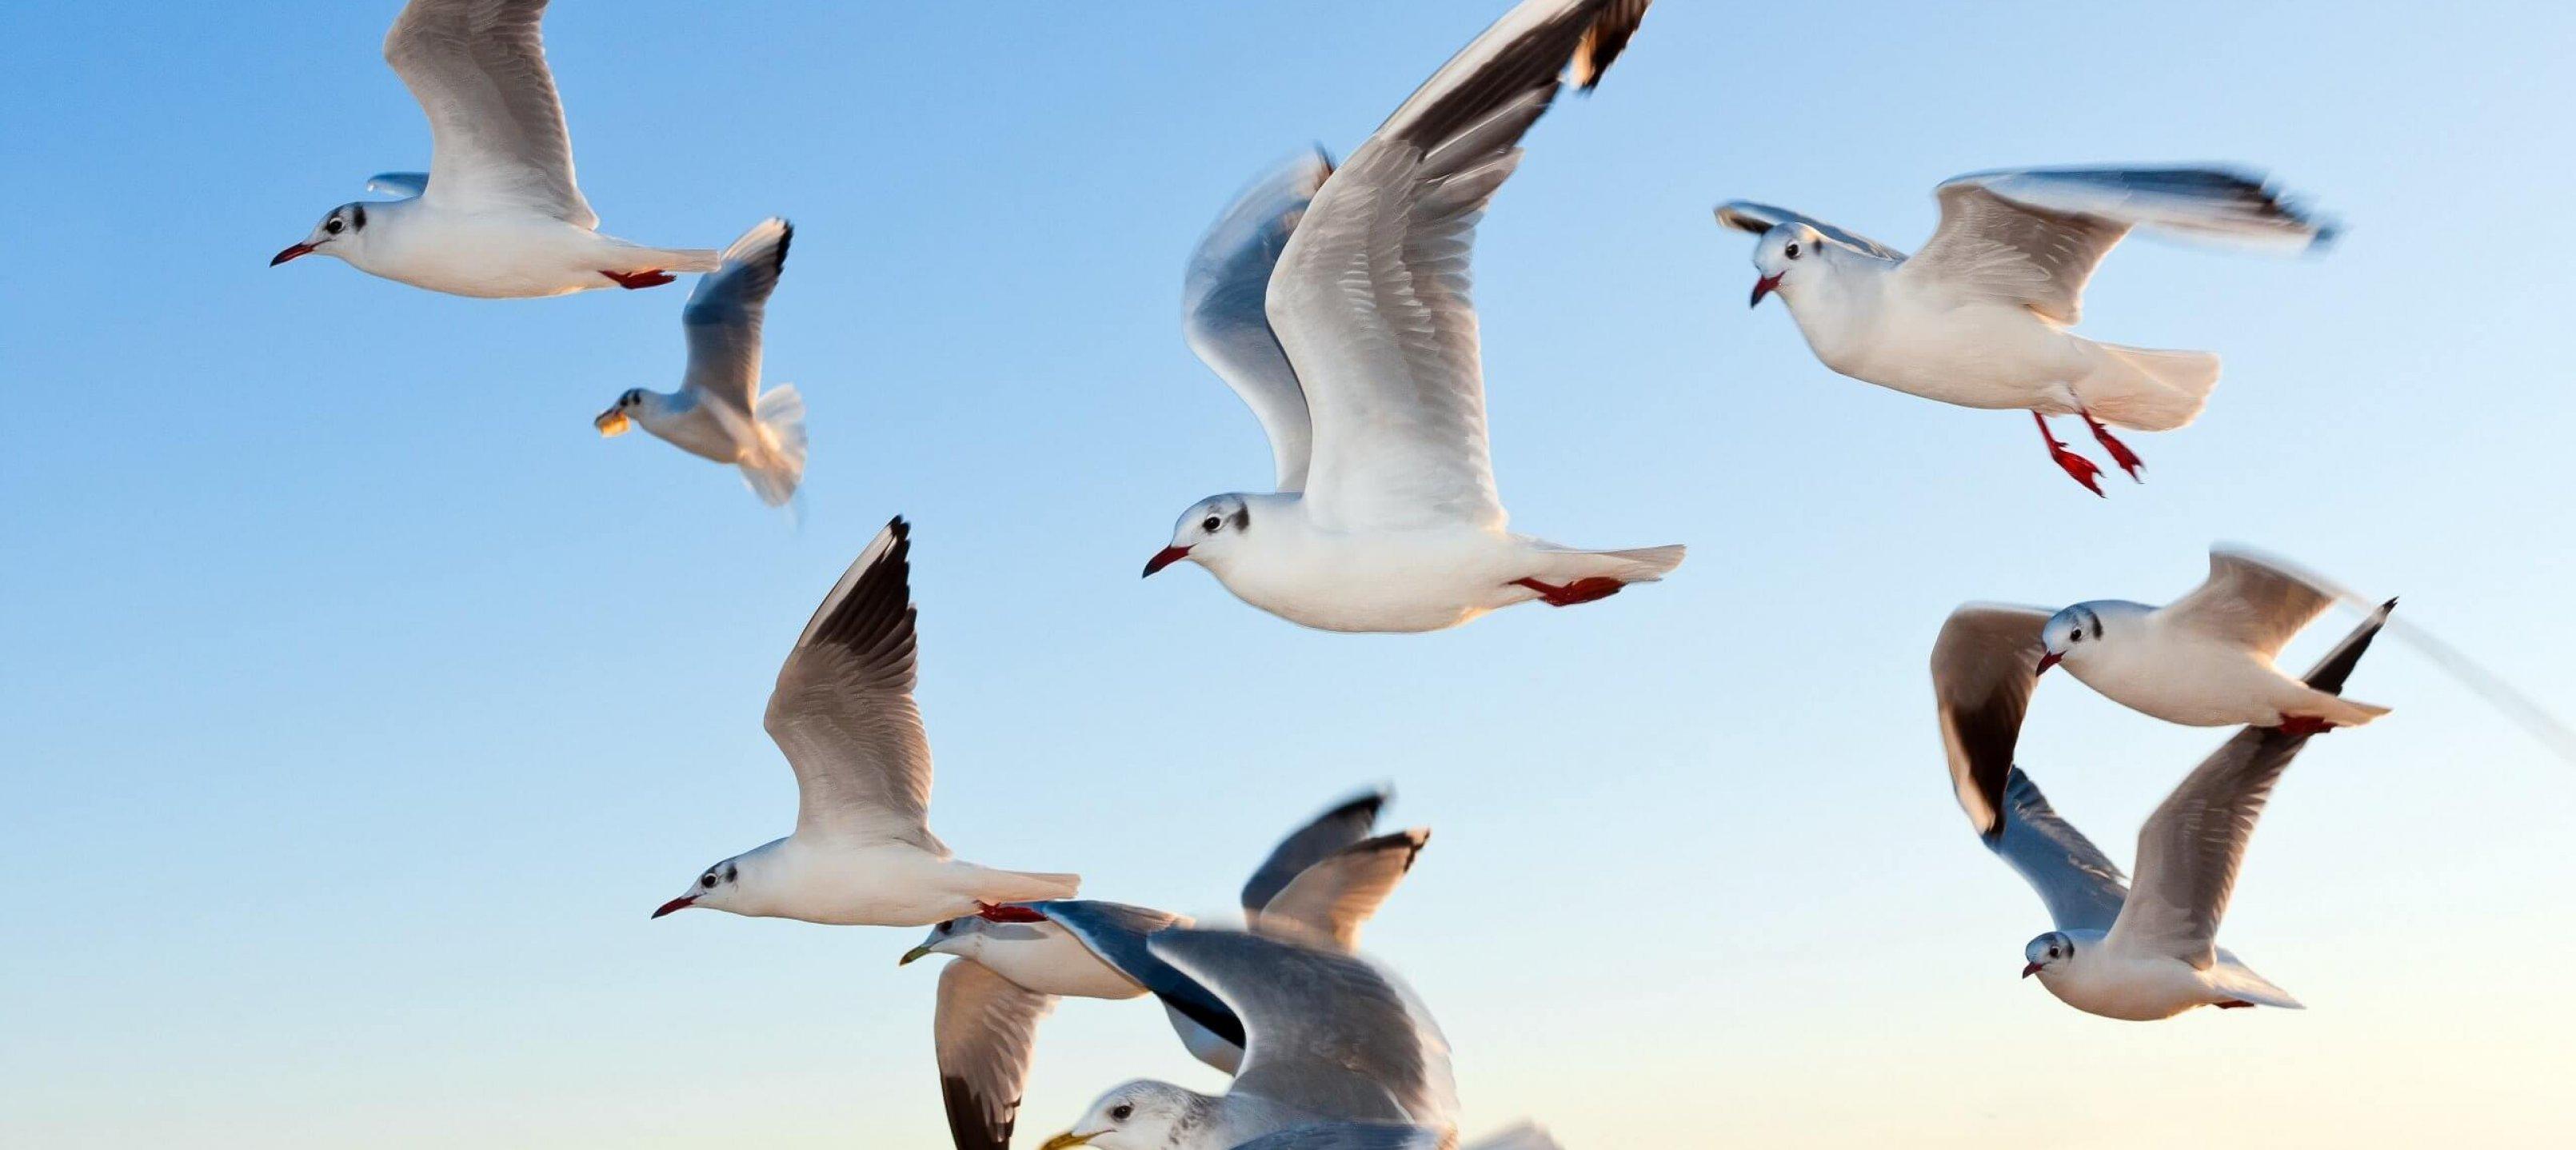 white-seagulls-near-water-54462